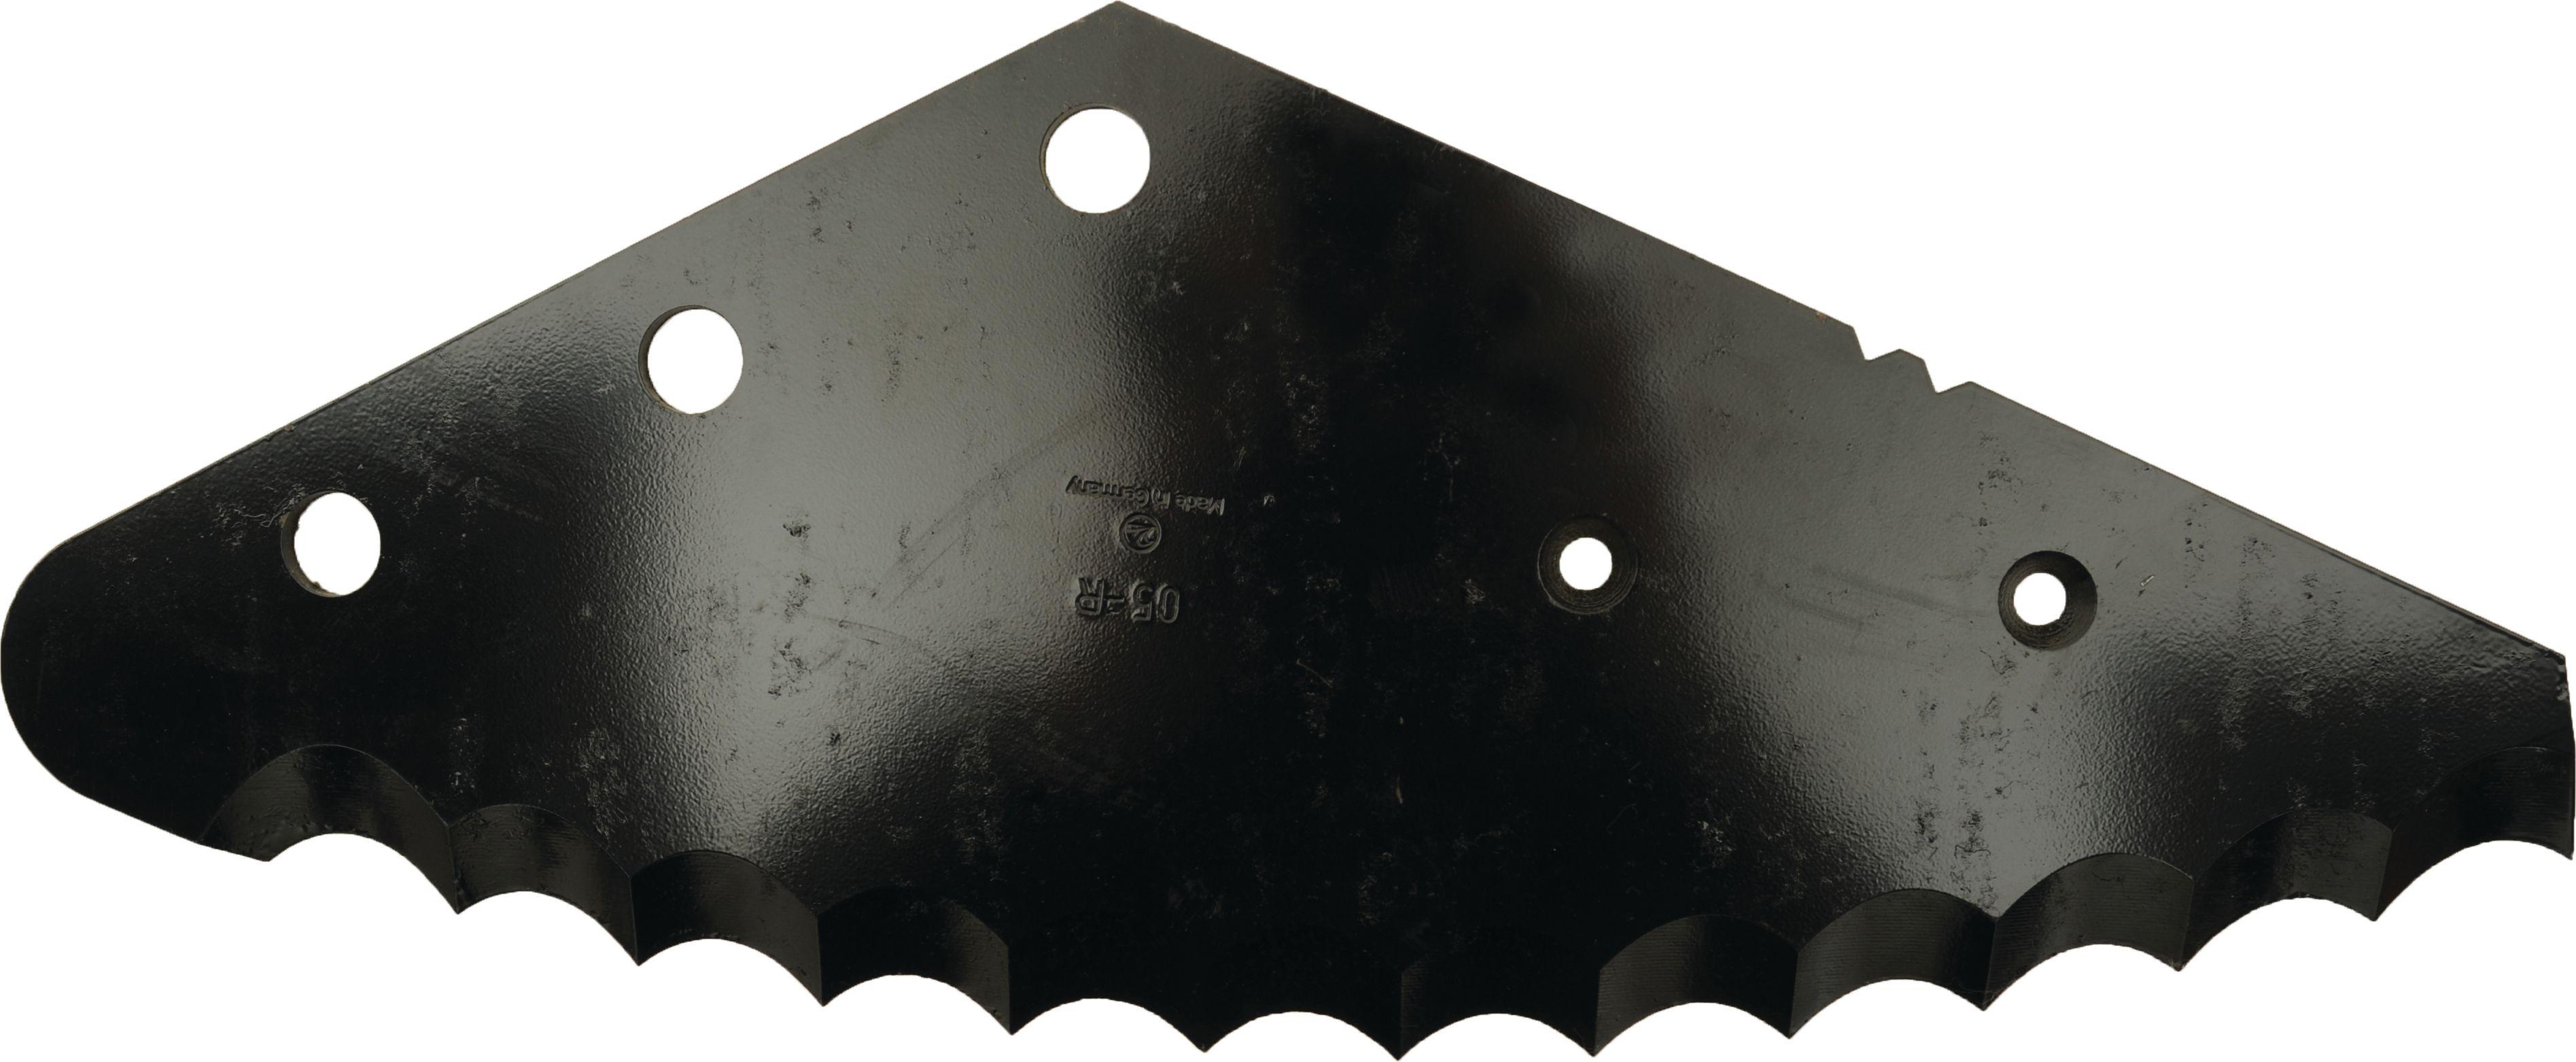 AGM BLADE - AGM 106404